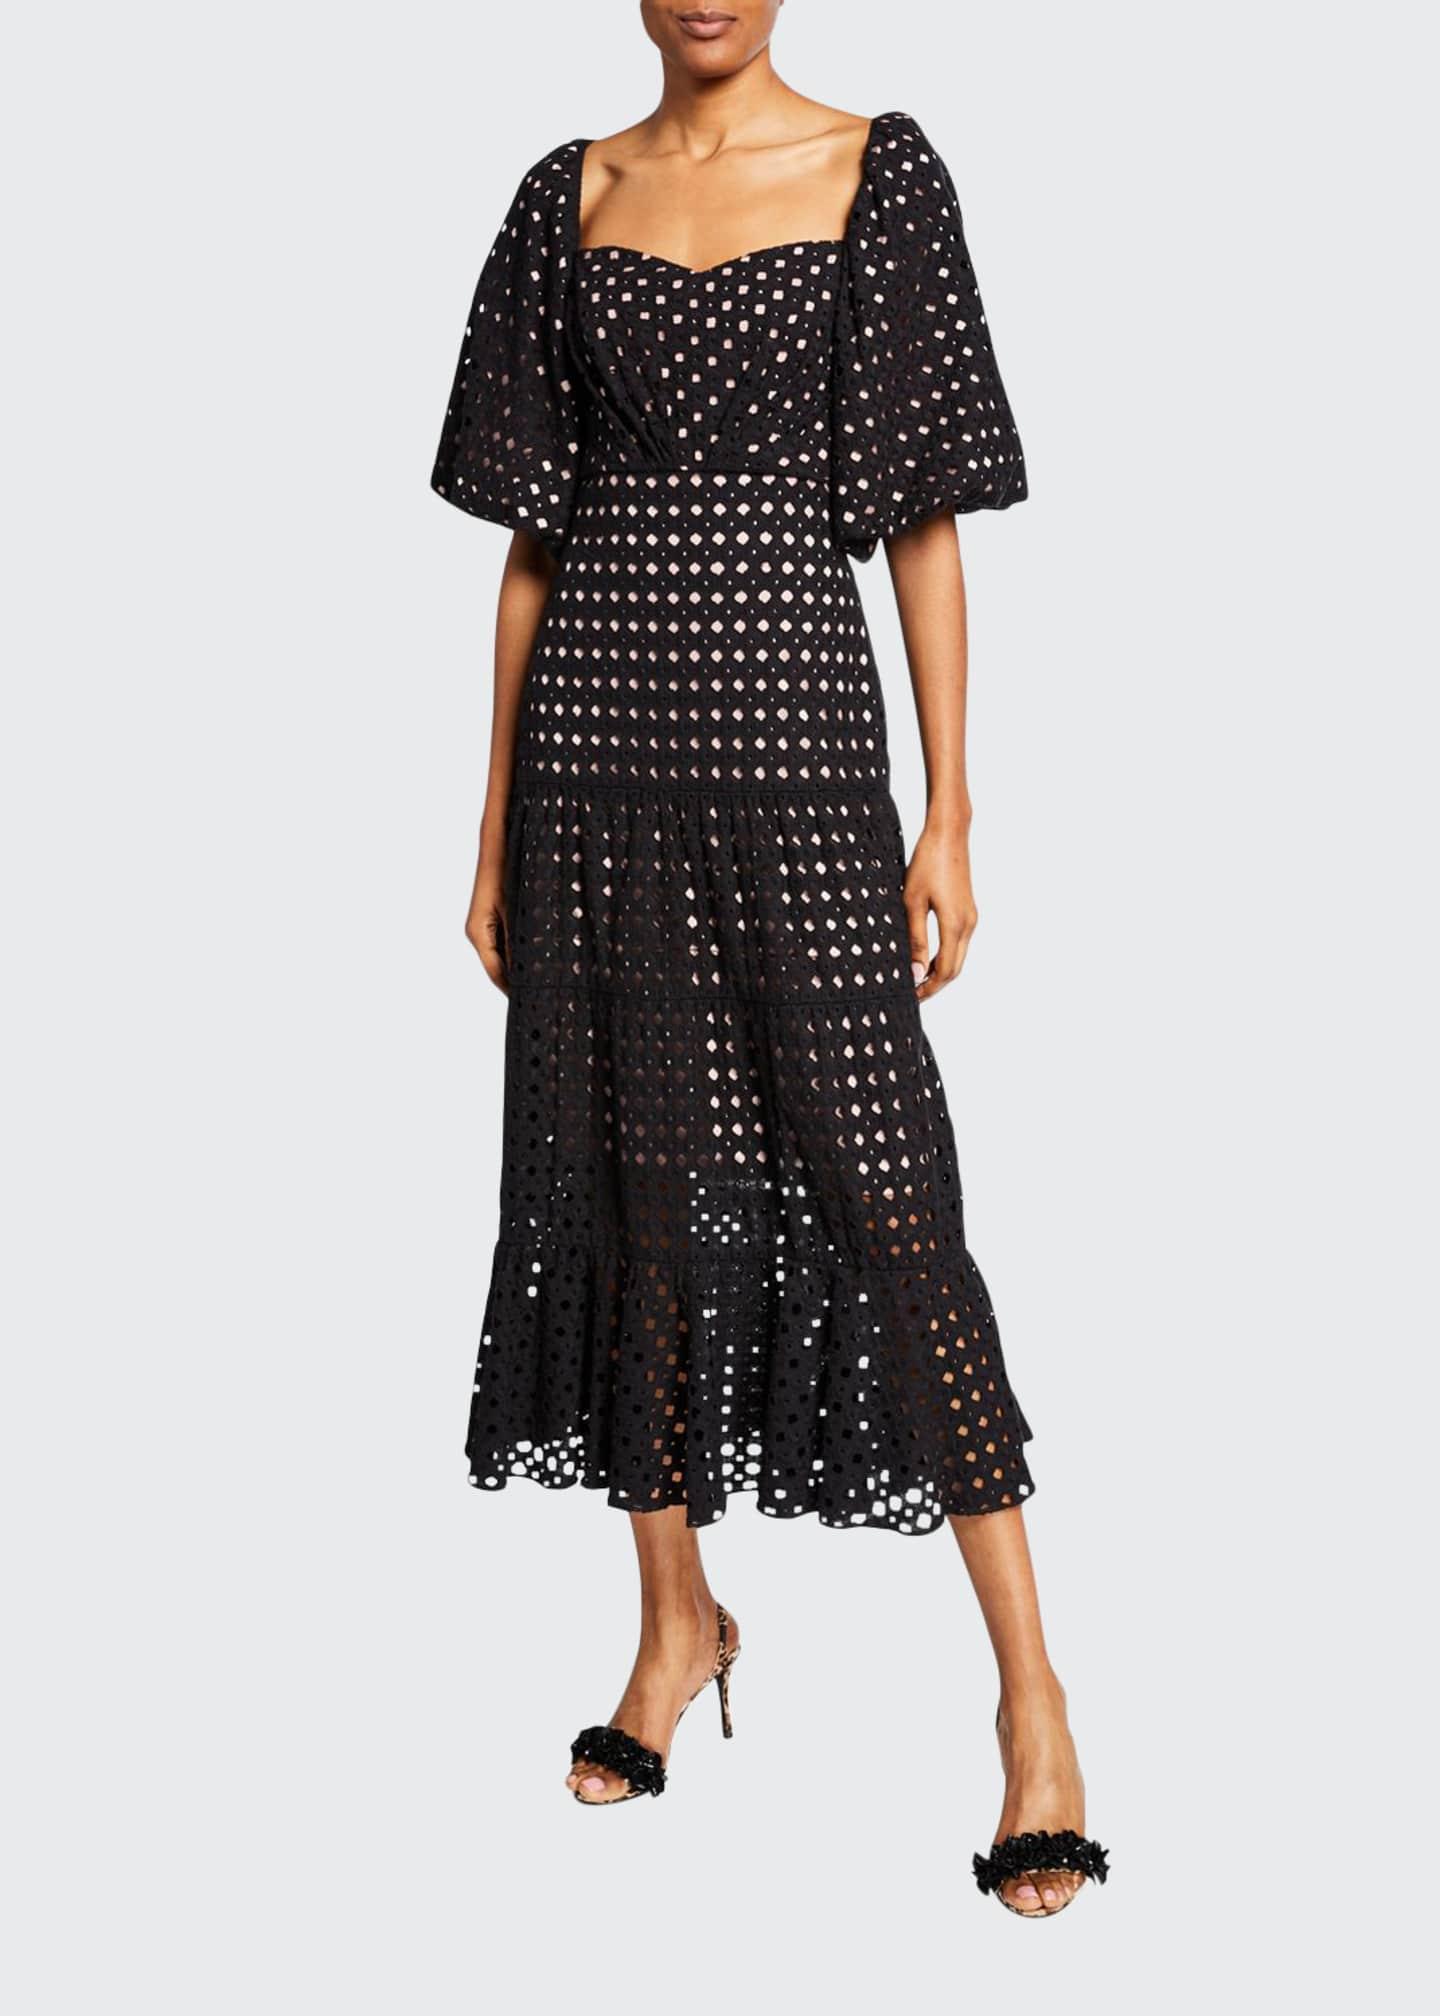 Johanna Ortiz Eyelet Embroidered Sweetheart-Neck Dress